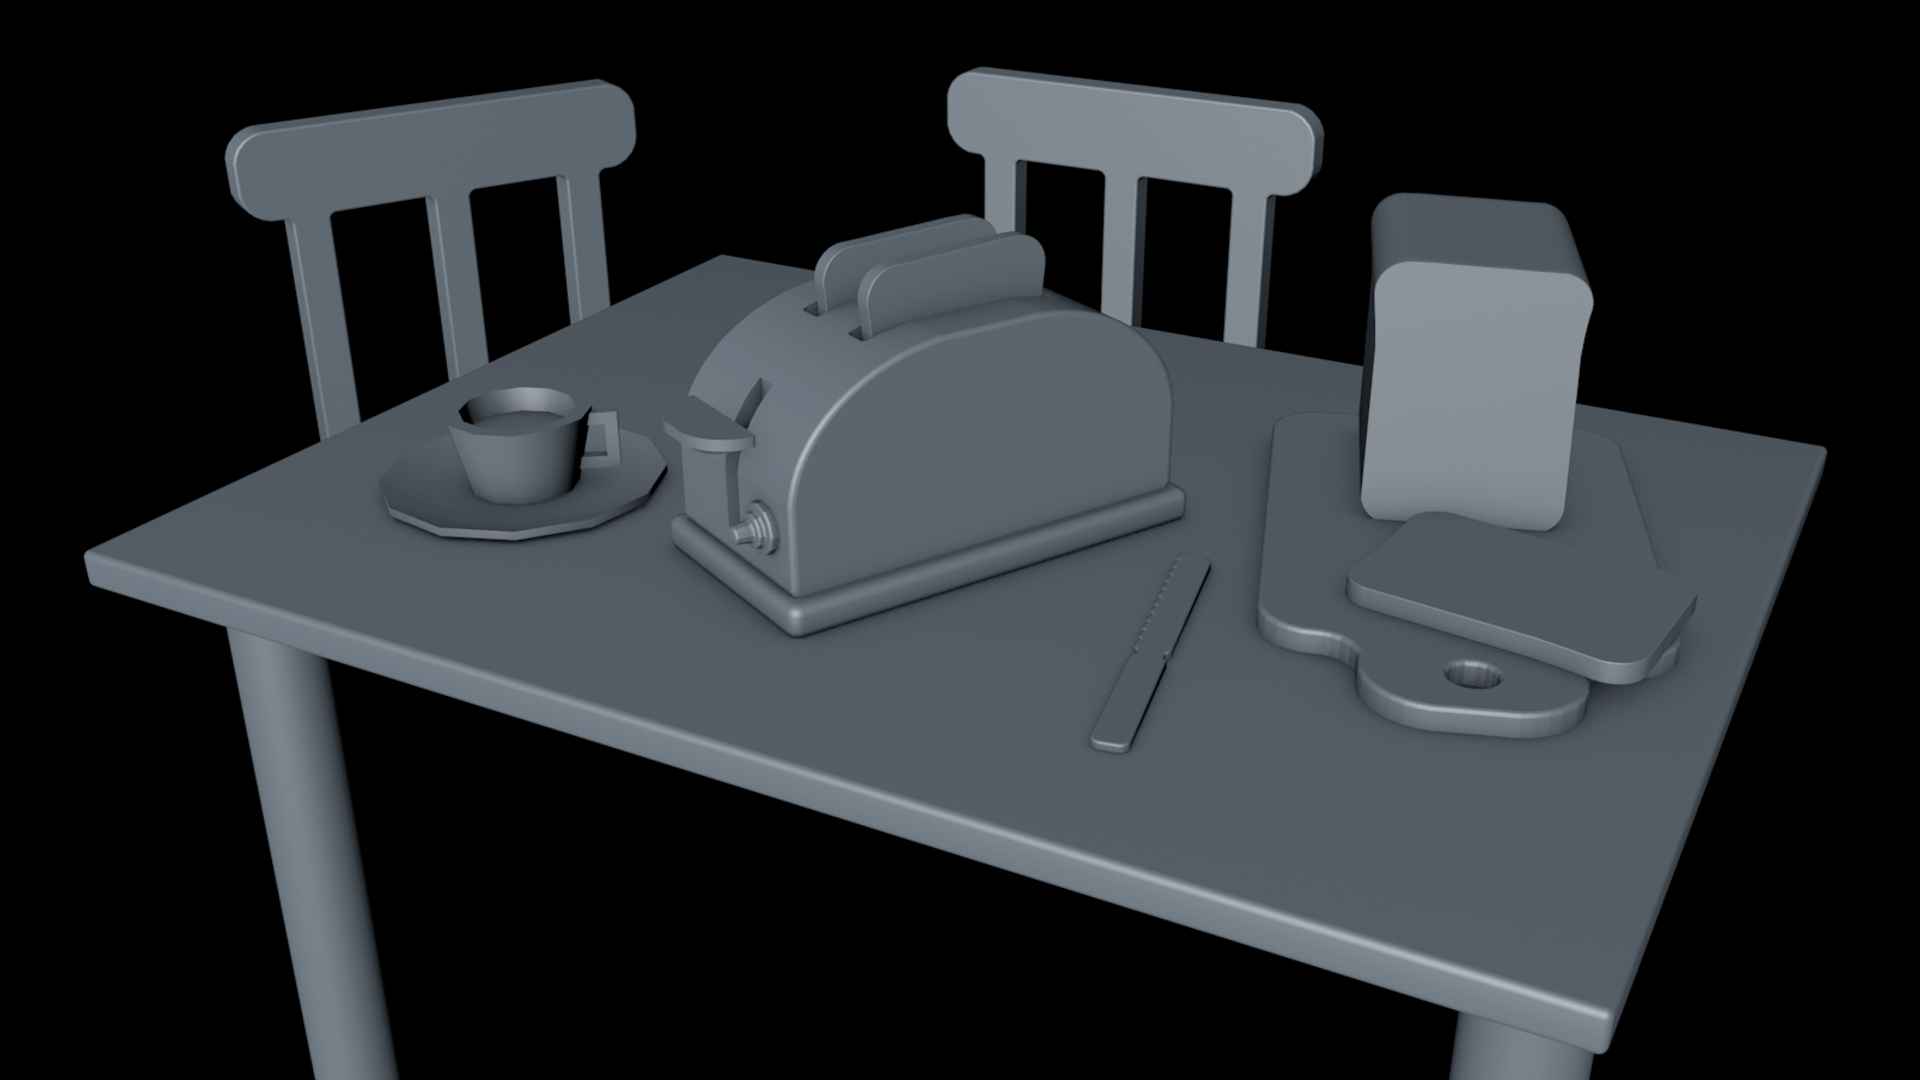 toaster_AO.jpg